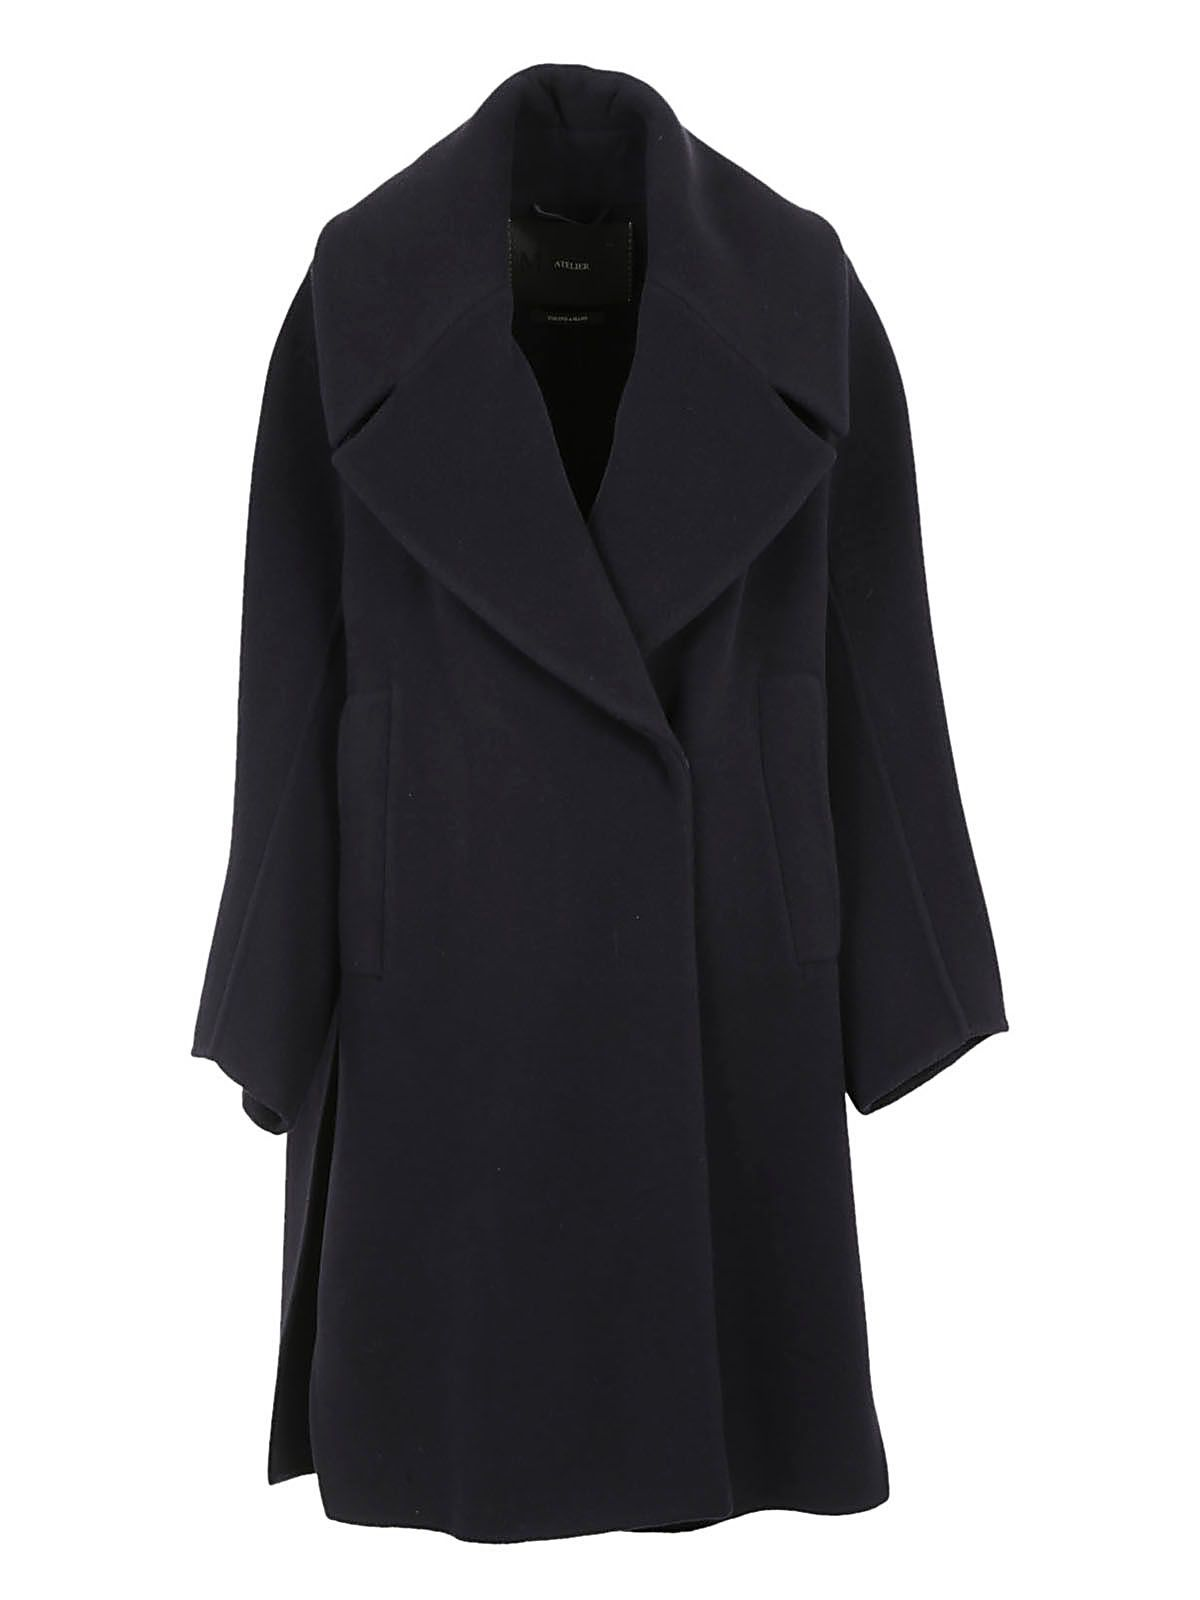 Max Mara Atelier Oversized Coat